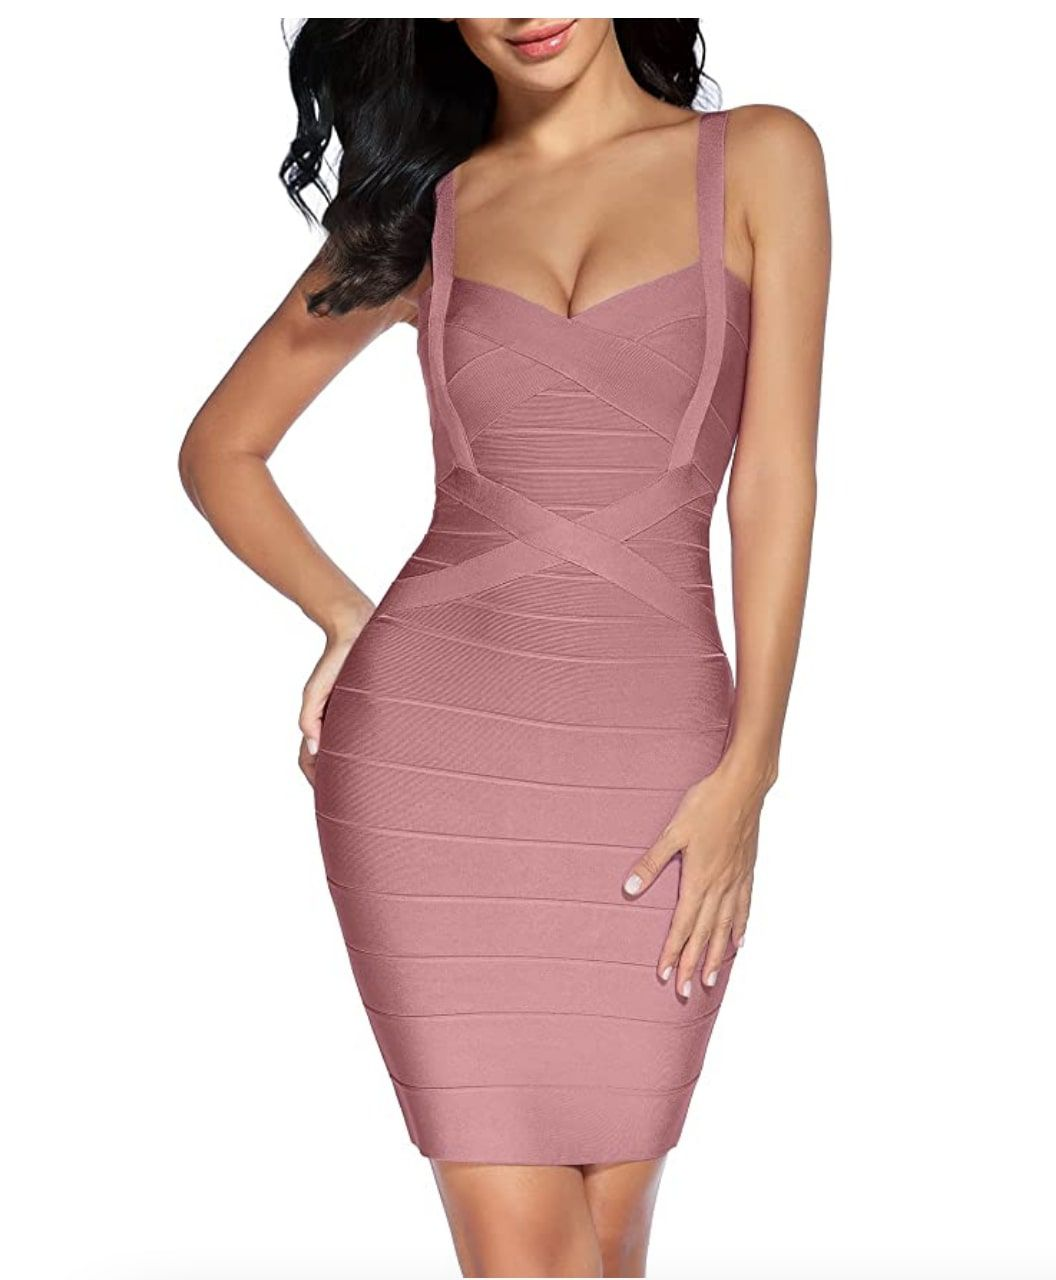 Style B07DJB7WYV Madam Uniq Pink Size 6 Sorority Formal Nightclub Cocktail Dress on Queenly